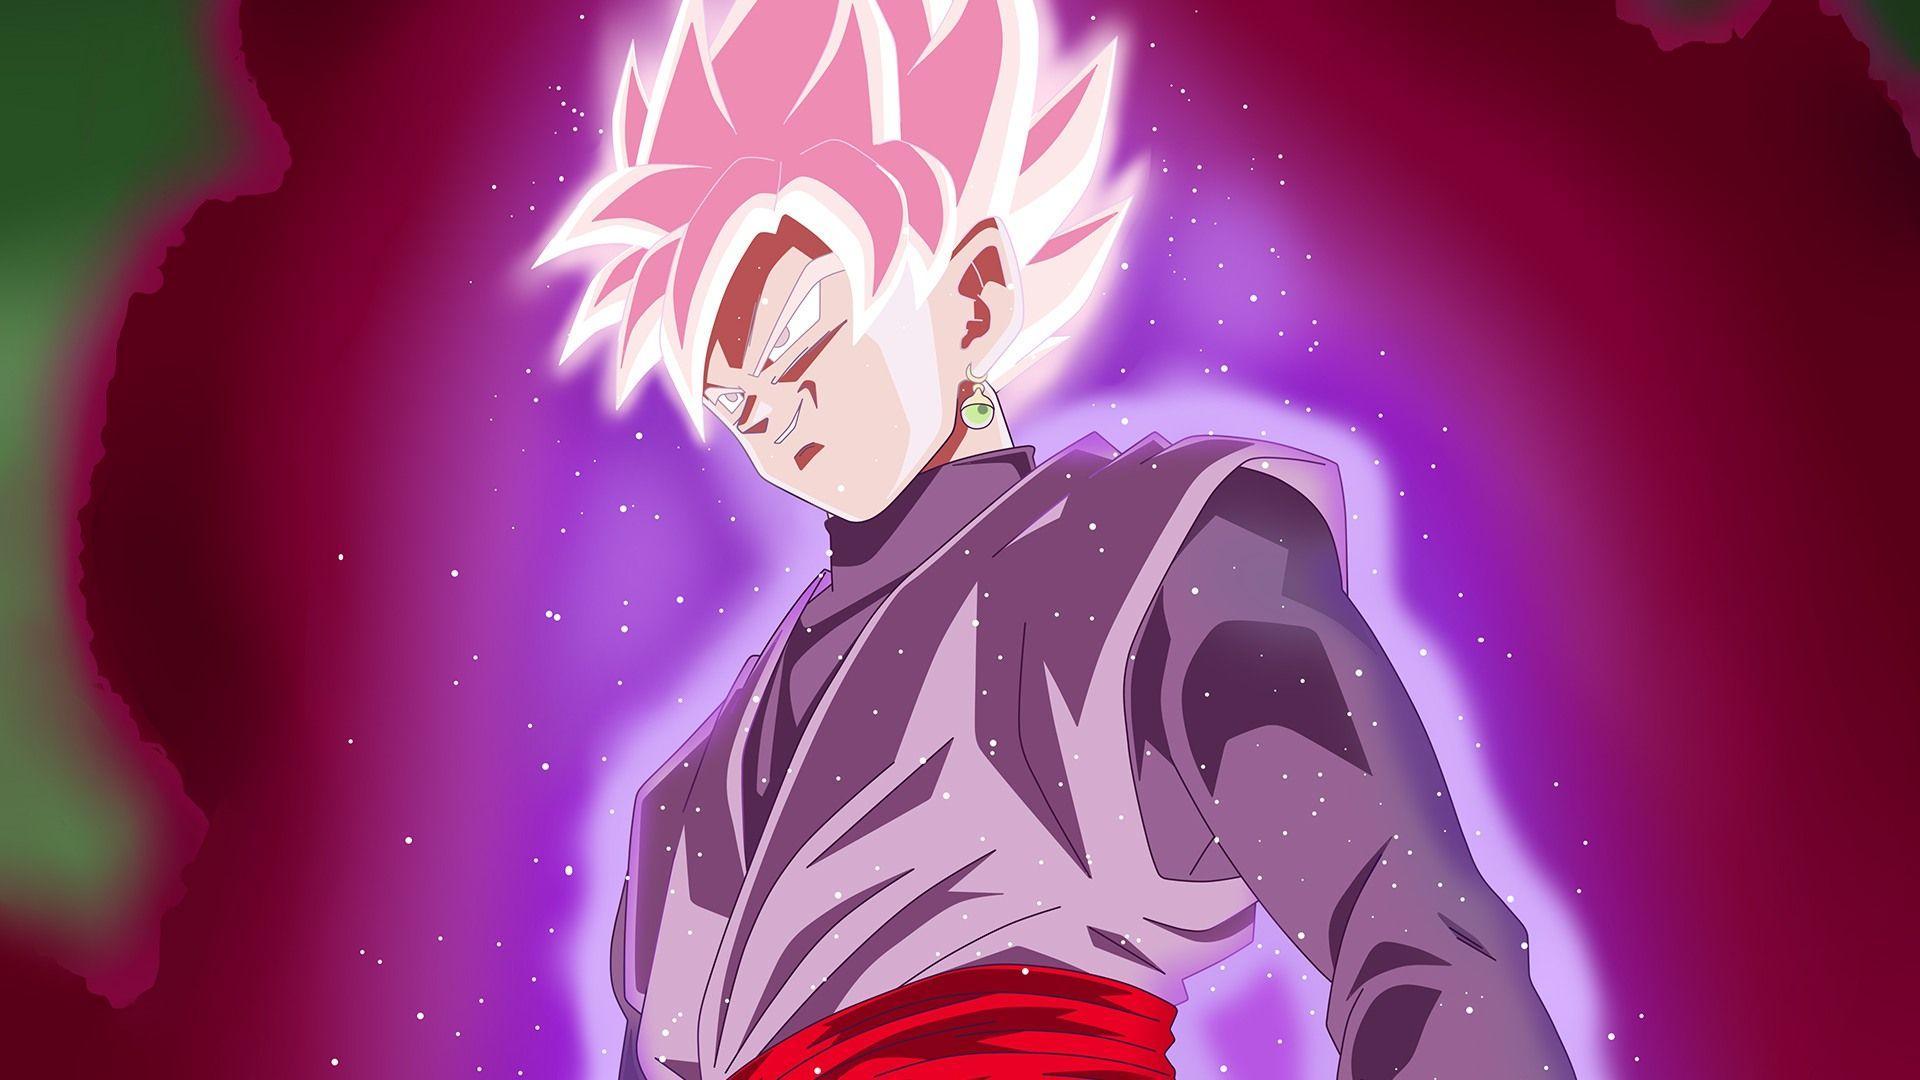 Goku Black Ssj Rose Wallpapers Top Free Goku Black Ssj Rose Backgrounds Wallpaperaccess